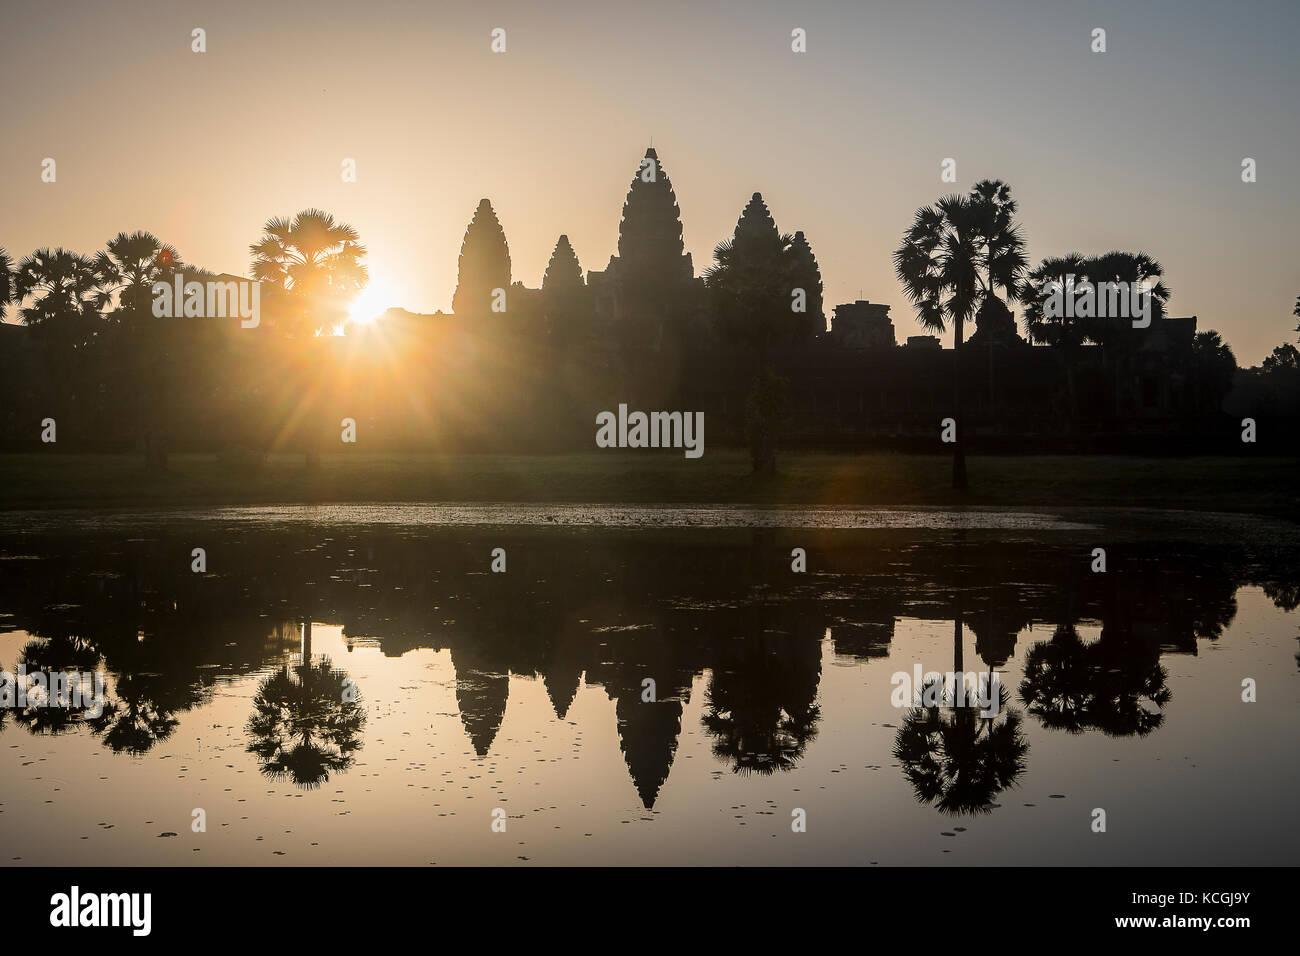 Sunrise, in Angkor Wat, Siem Reap, Cambodia - Stock Image